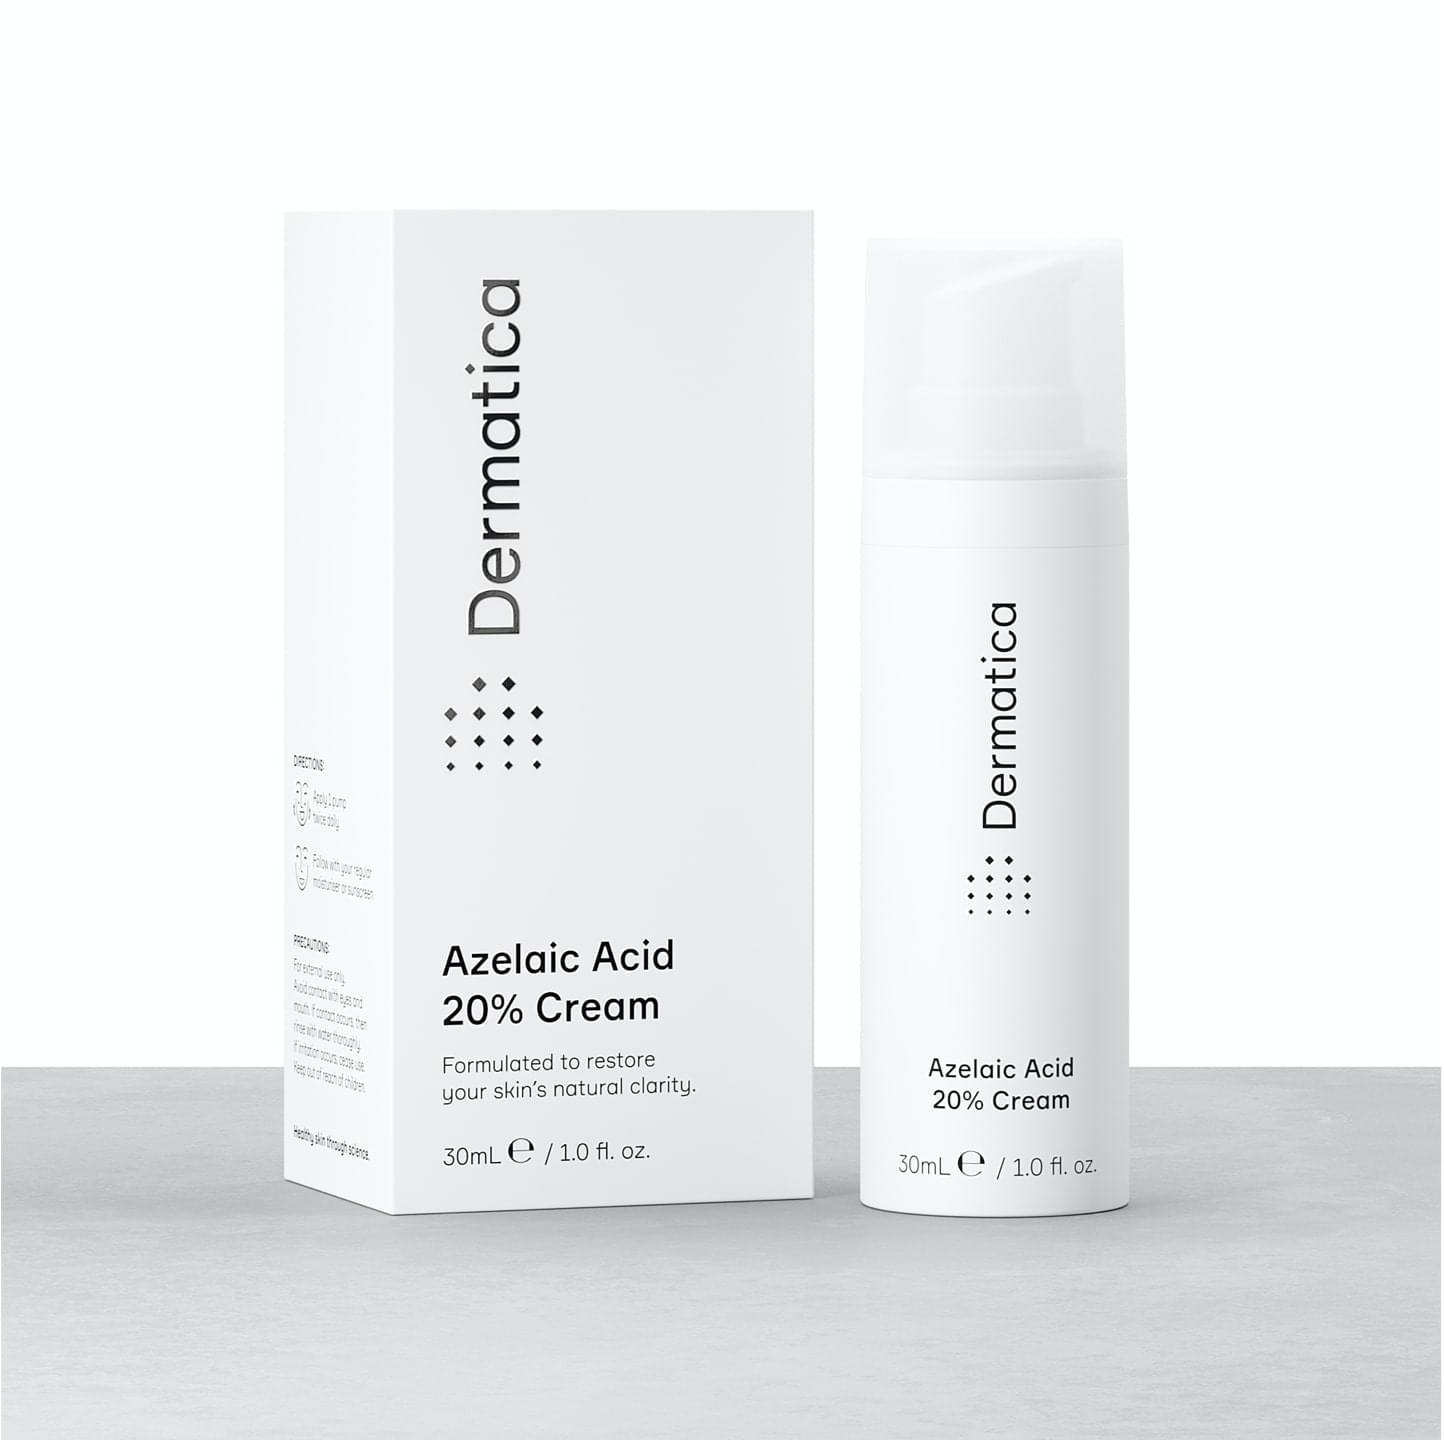 Dermatica - Azelaic Acid 20%